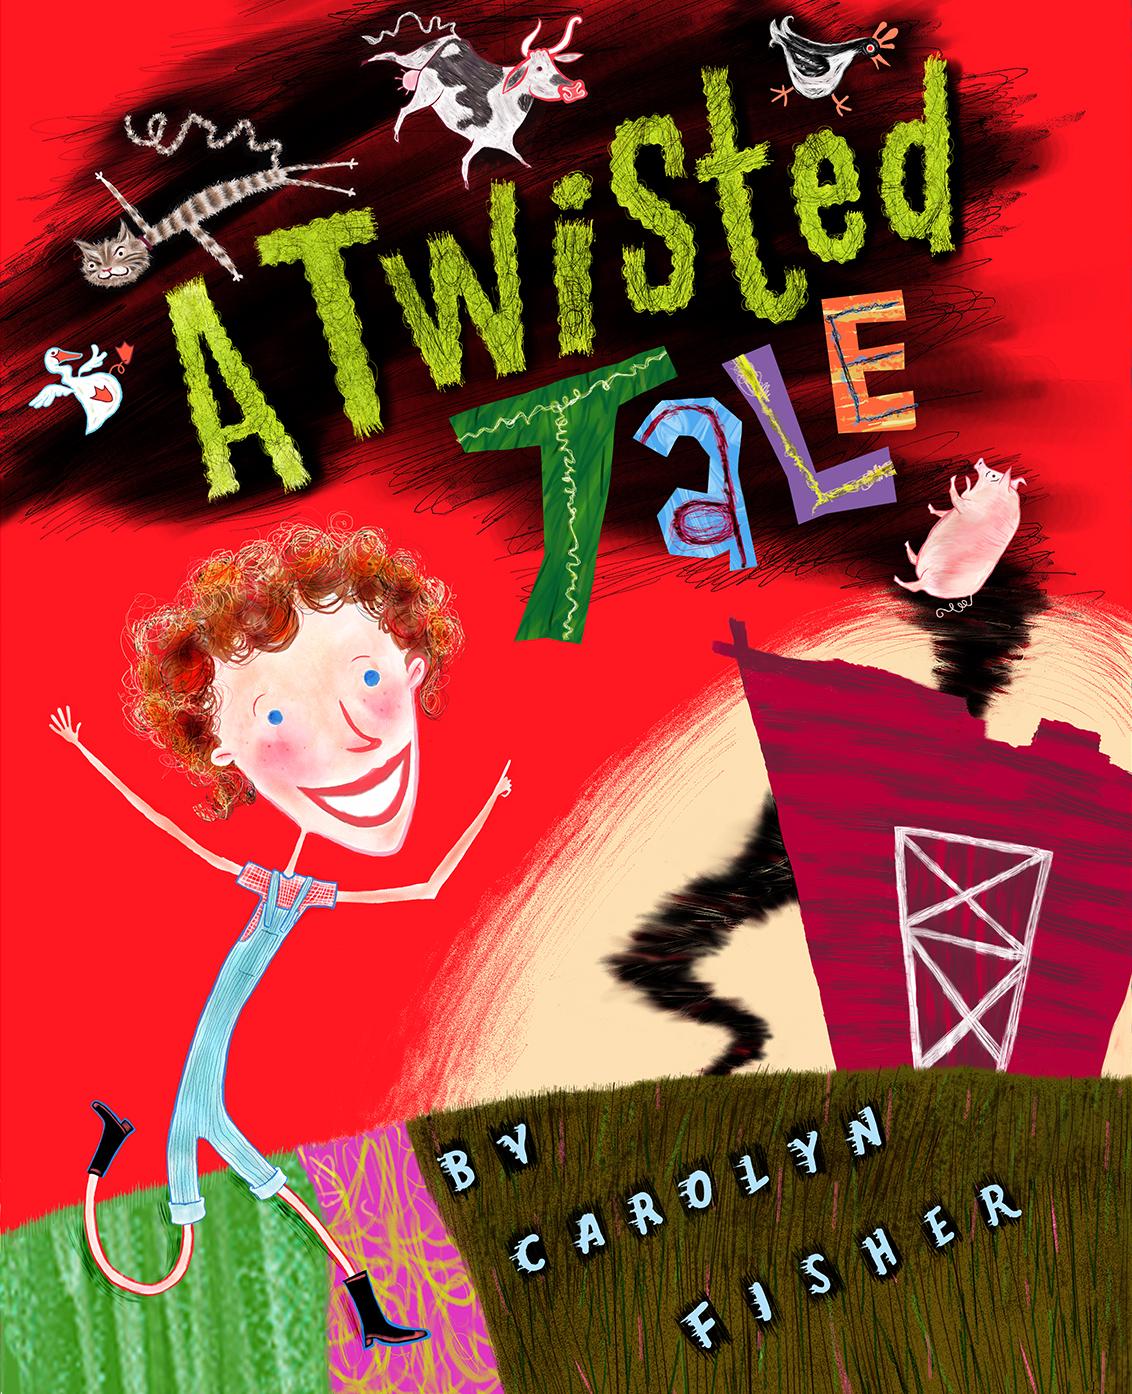 ATwistedTale_cvr_CarolynFisher_children'sbook_illustration_1500pxW